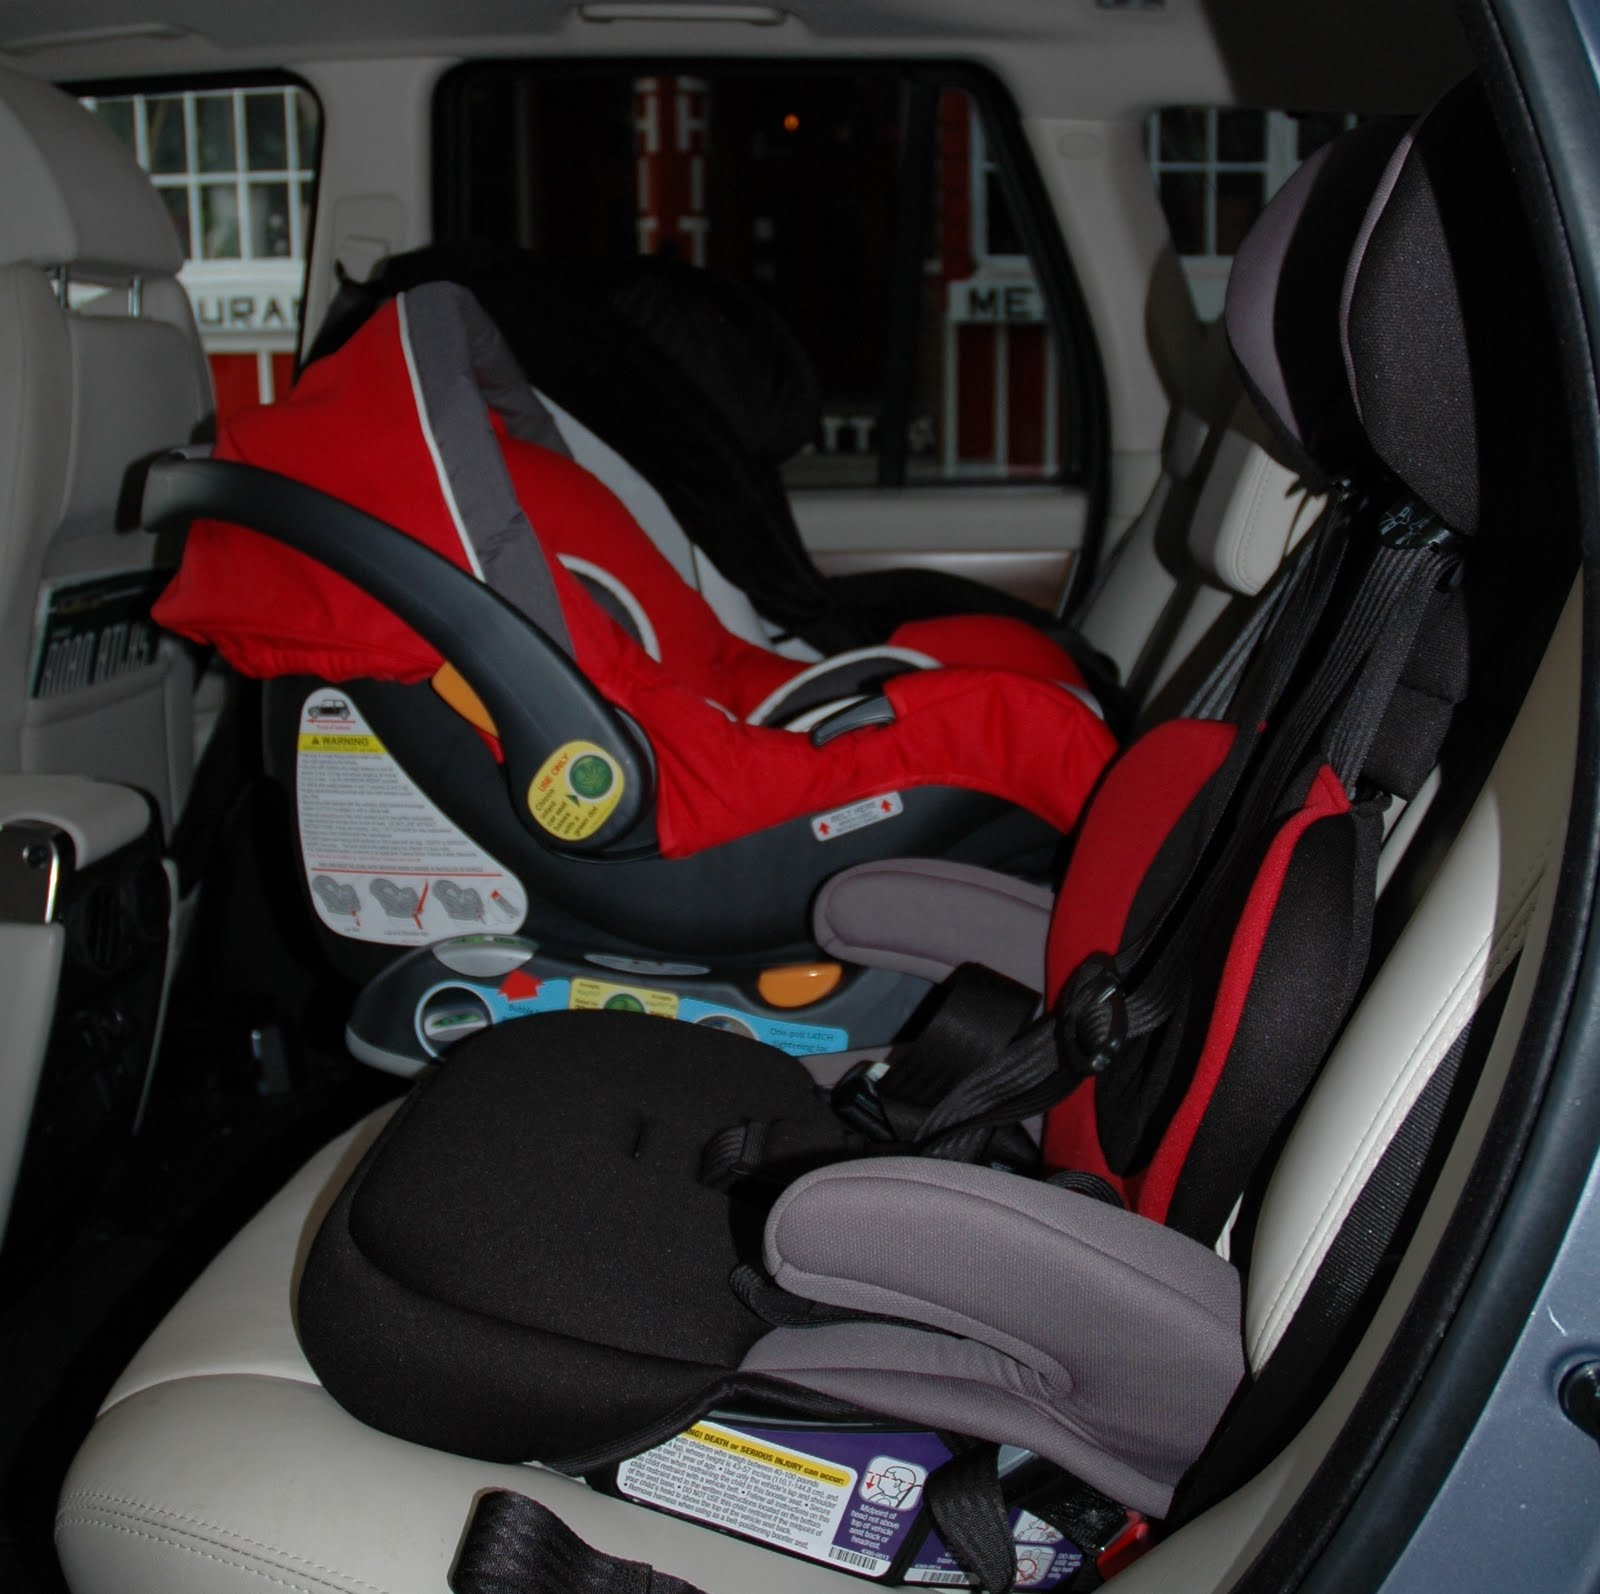 3 Car Seats In 2008 Range Rover Sport